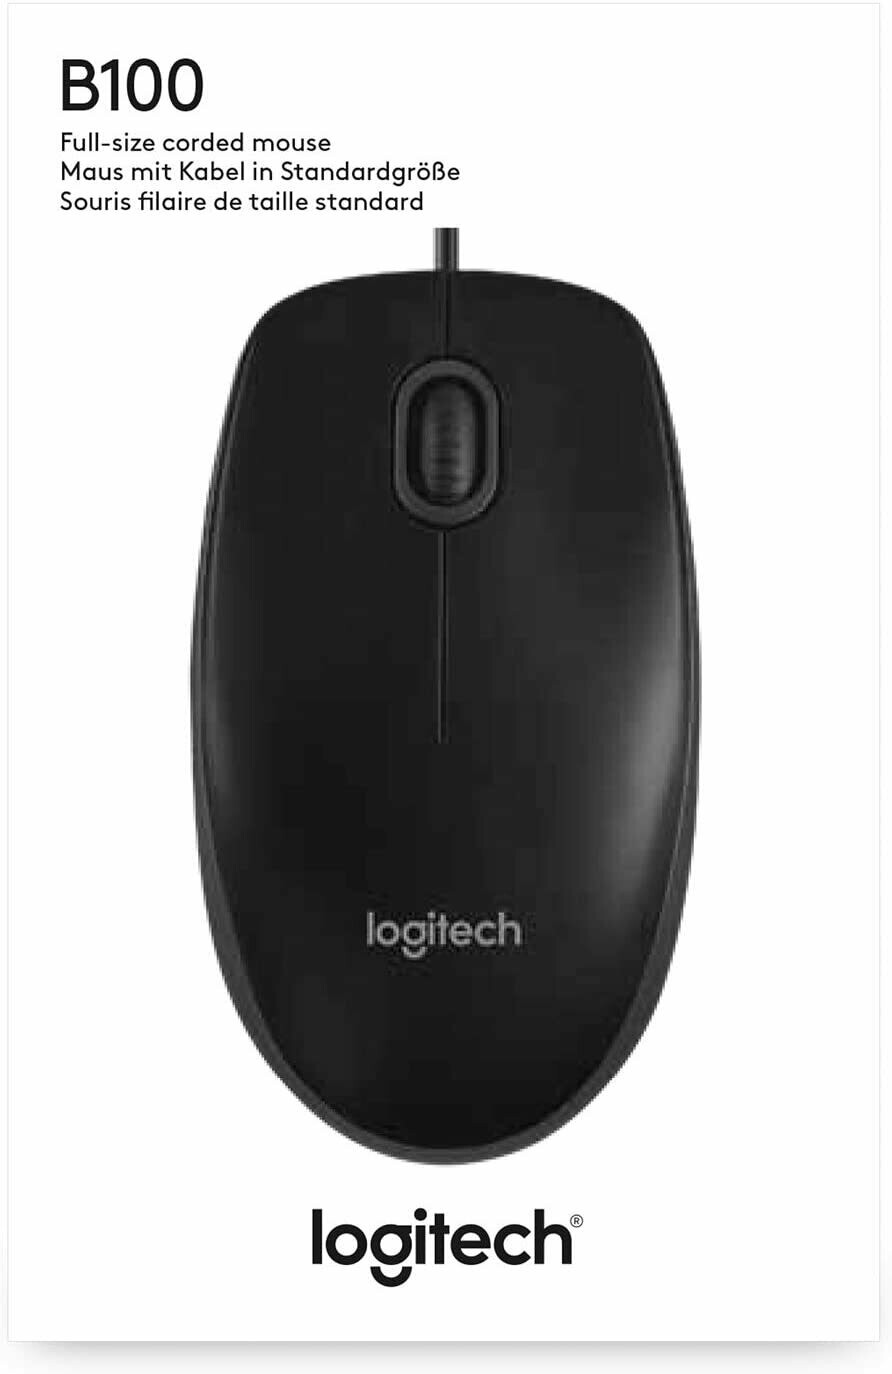 Logitech Corded Mouse B100